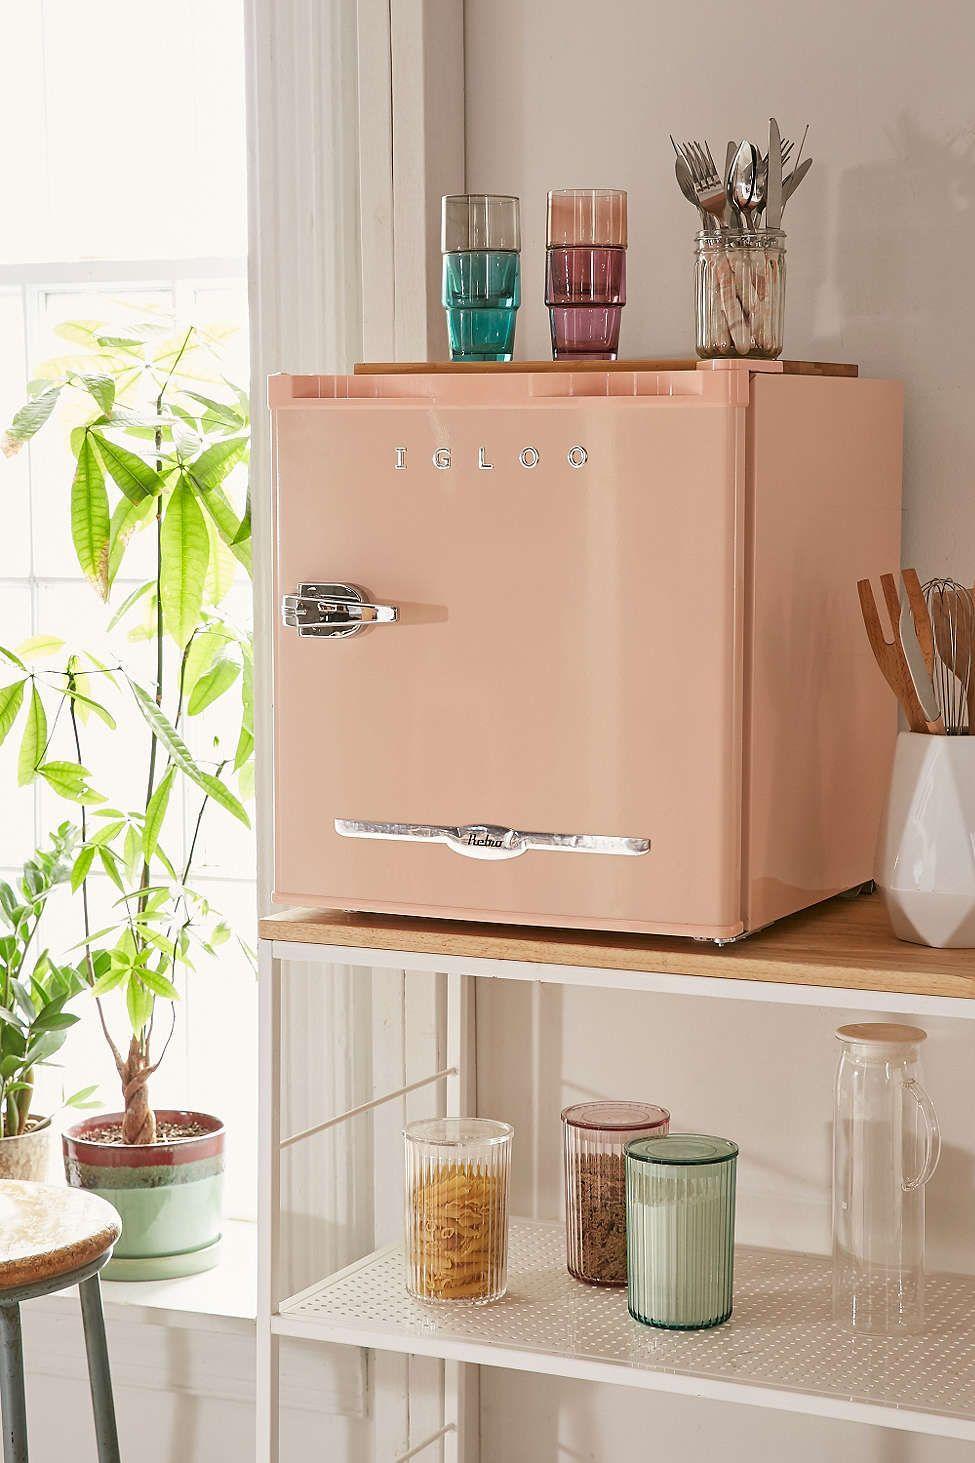 Mini Refrigerator in 2019 | Things I Love! | Mini fridge, Home, Dorm ...